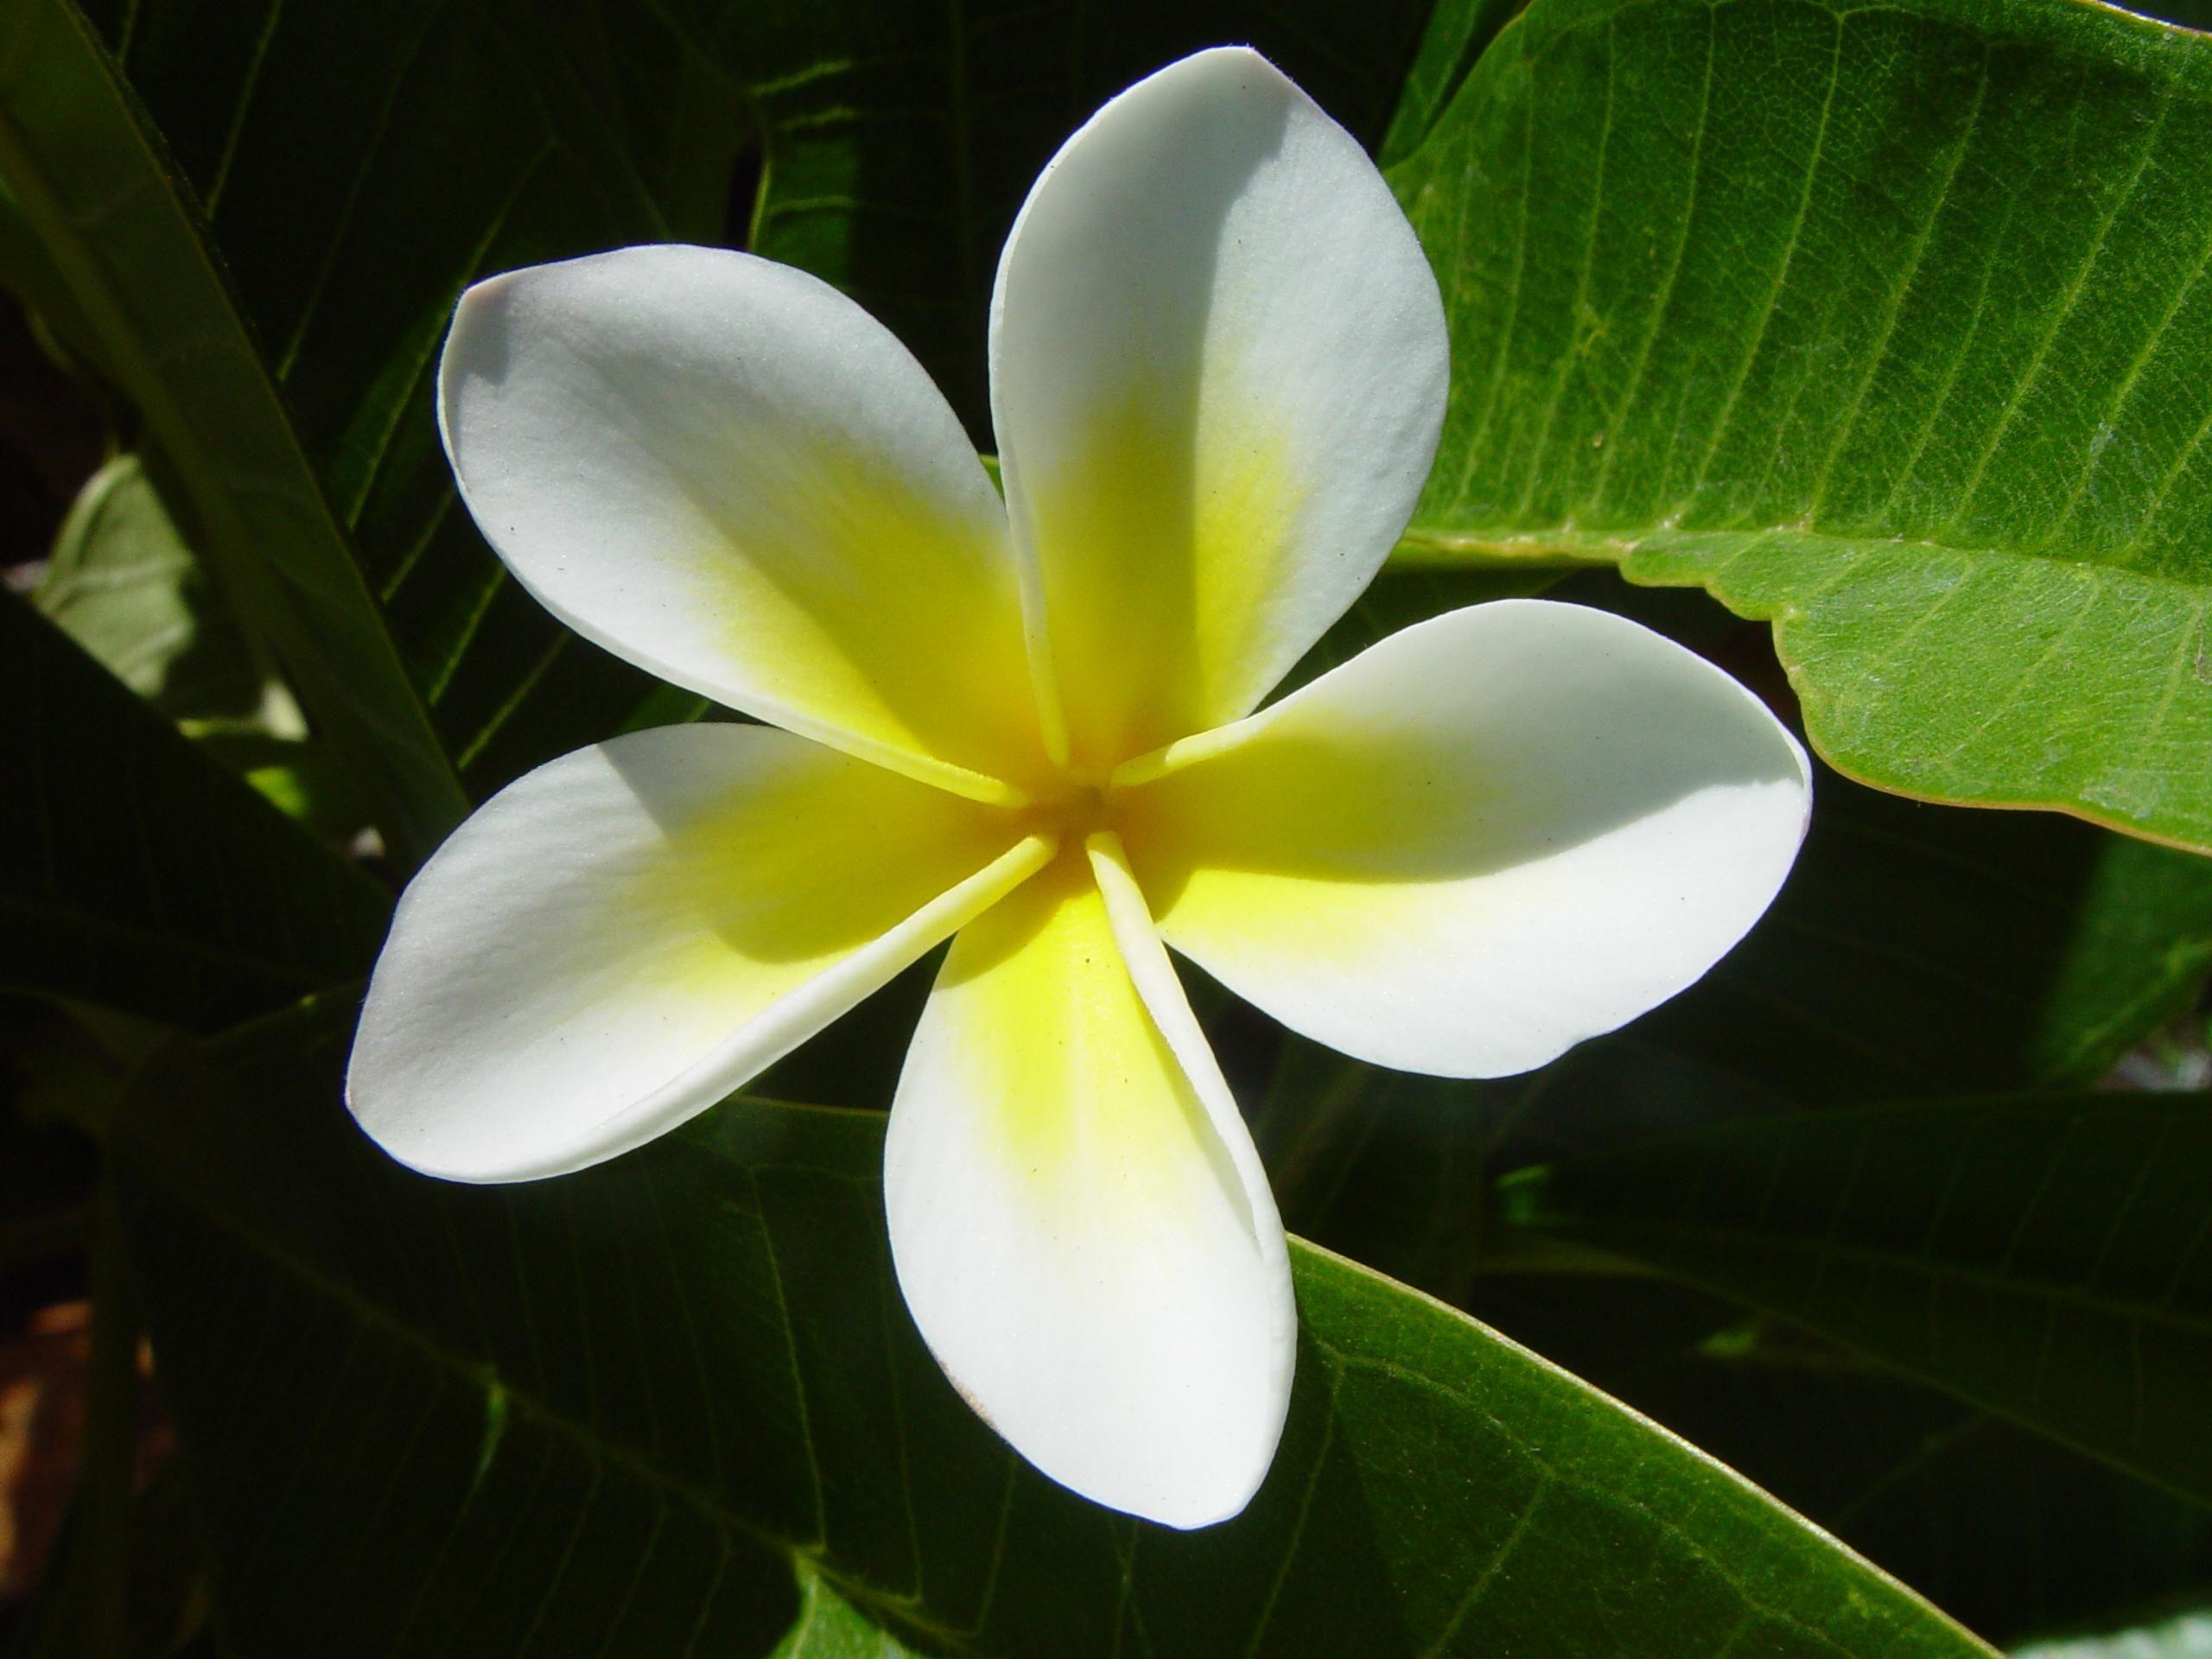 White and yellow plumeria flower (common name ''Frangipani'') #Flowers #FloweringsPlants